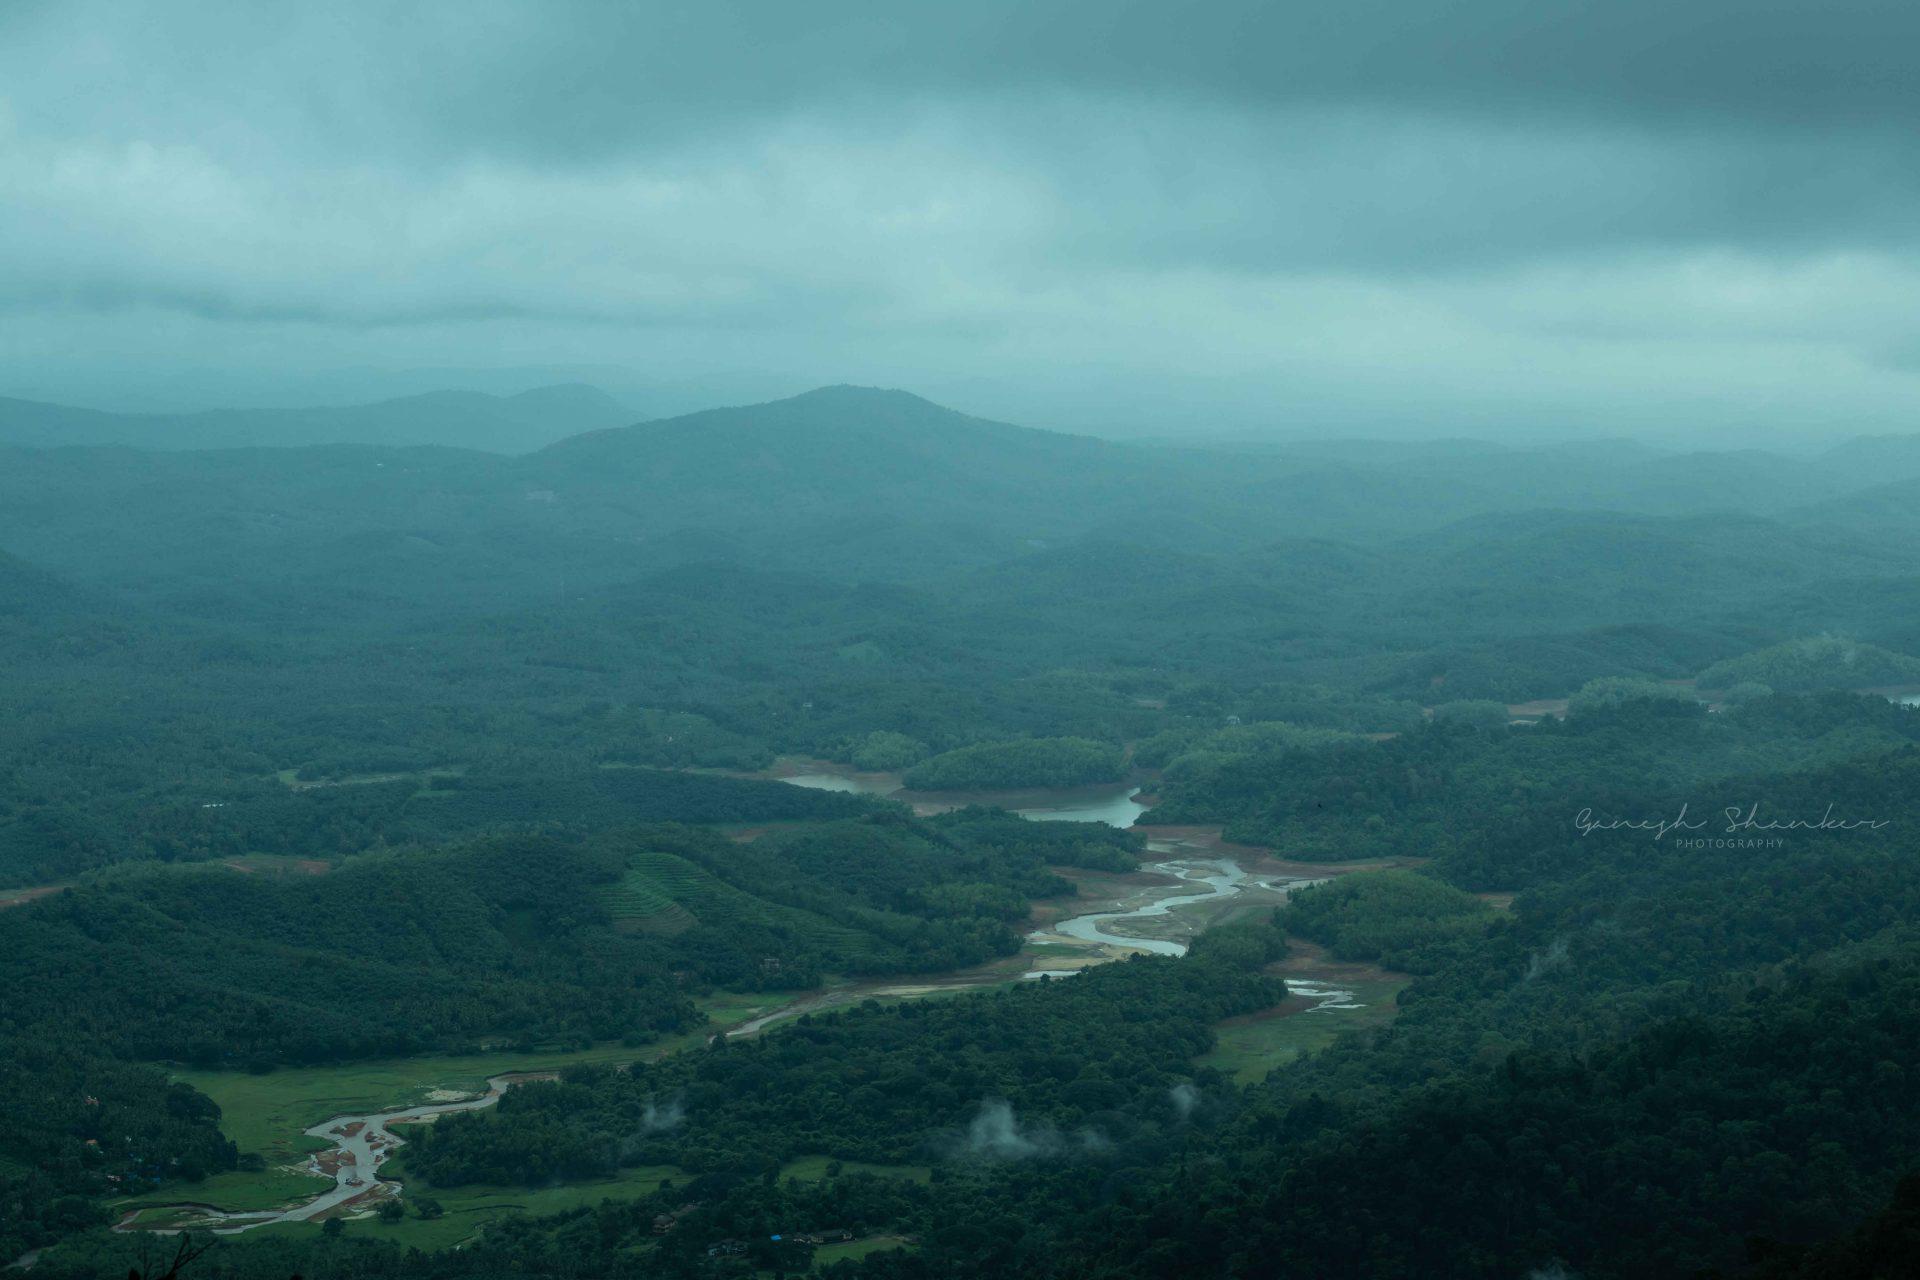 kakkayam-landscape-photograph-ganesh-shanker-kk